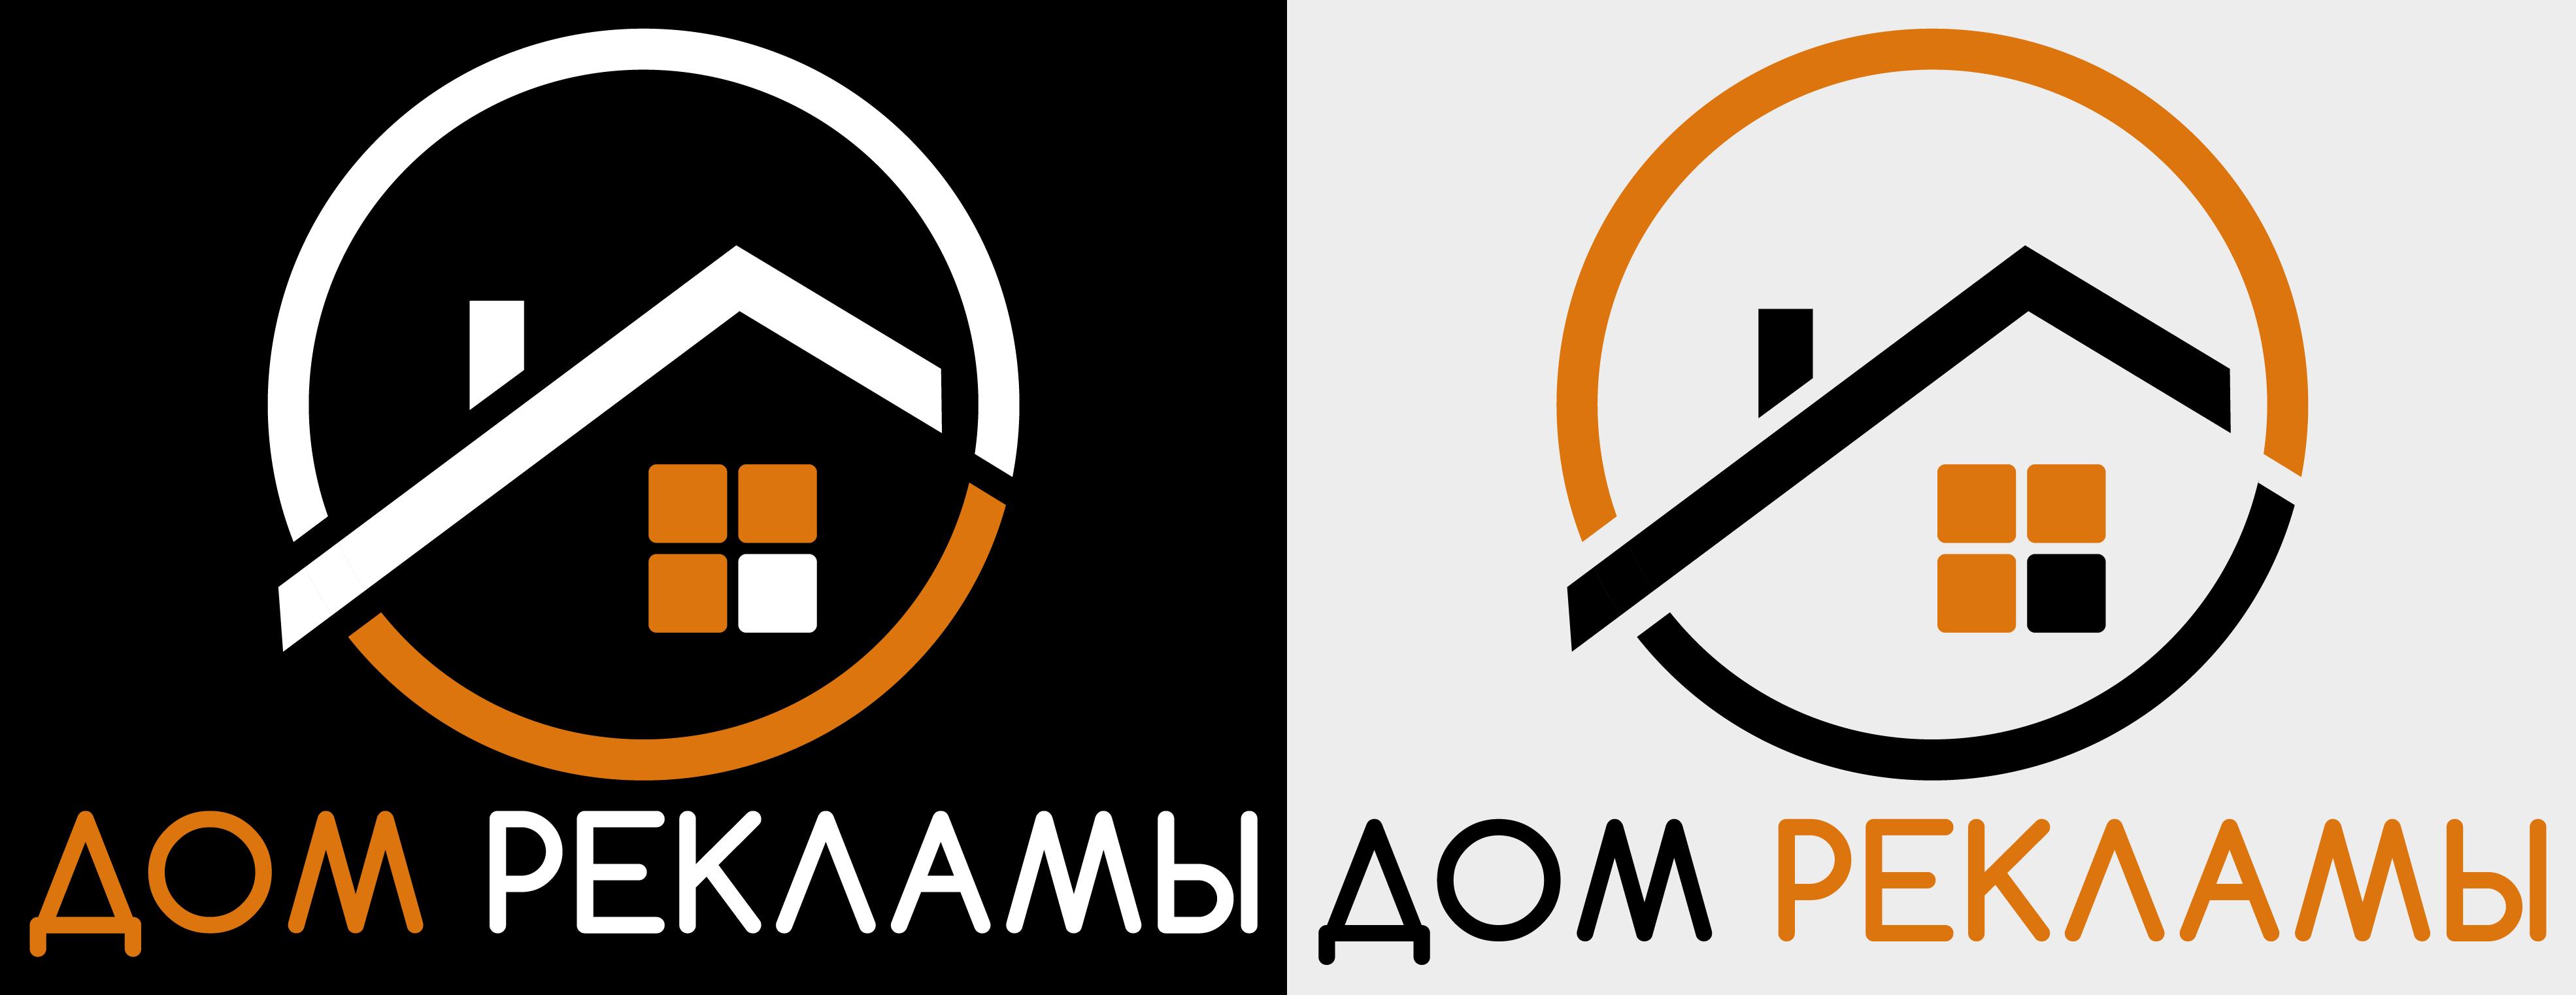 Дизайн логотипа рекламно-производственной компании фото f_4175edd1c387b61a.png